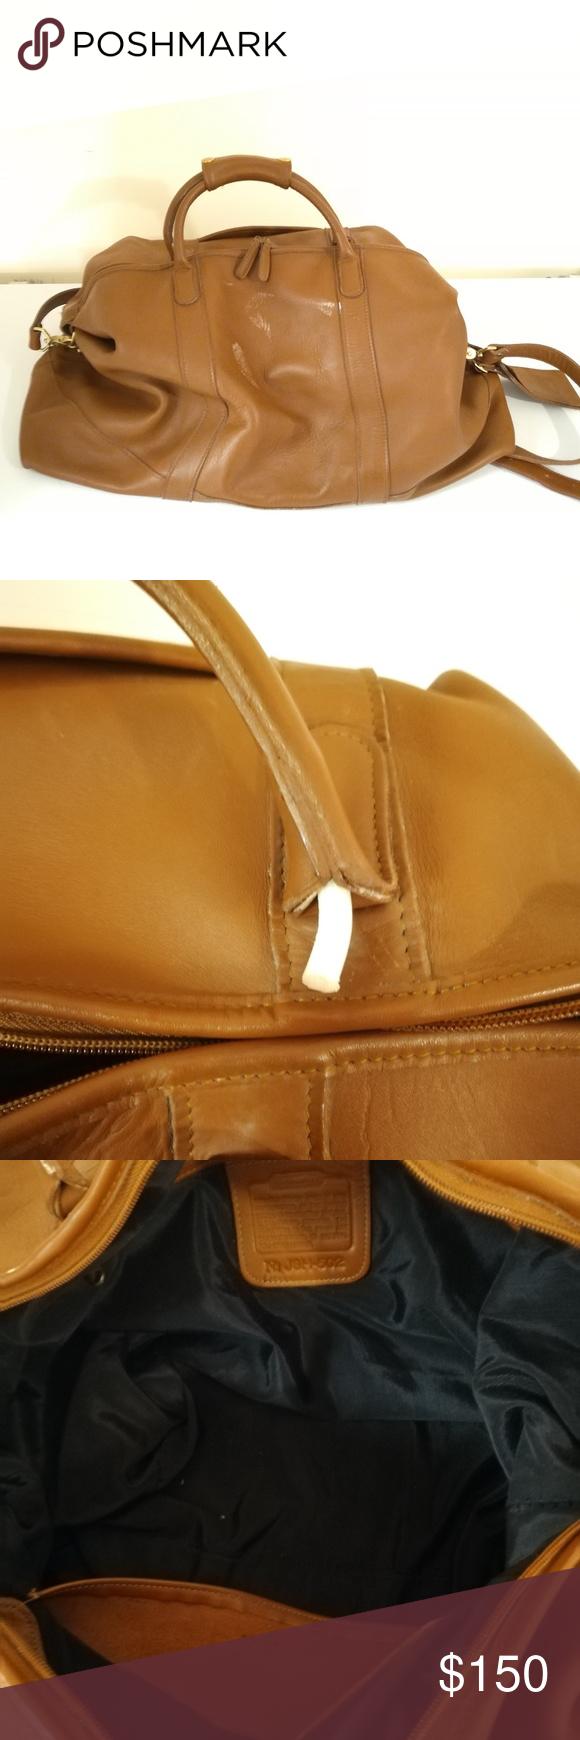 Vintage Coach Travel Bag Vintage Brown Leather Coach Travel Bag